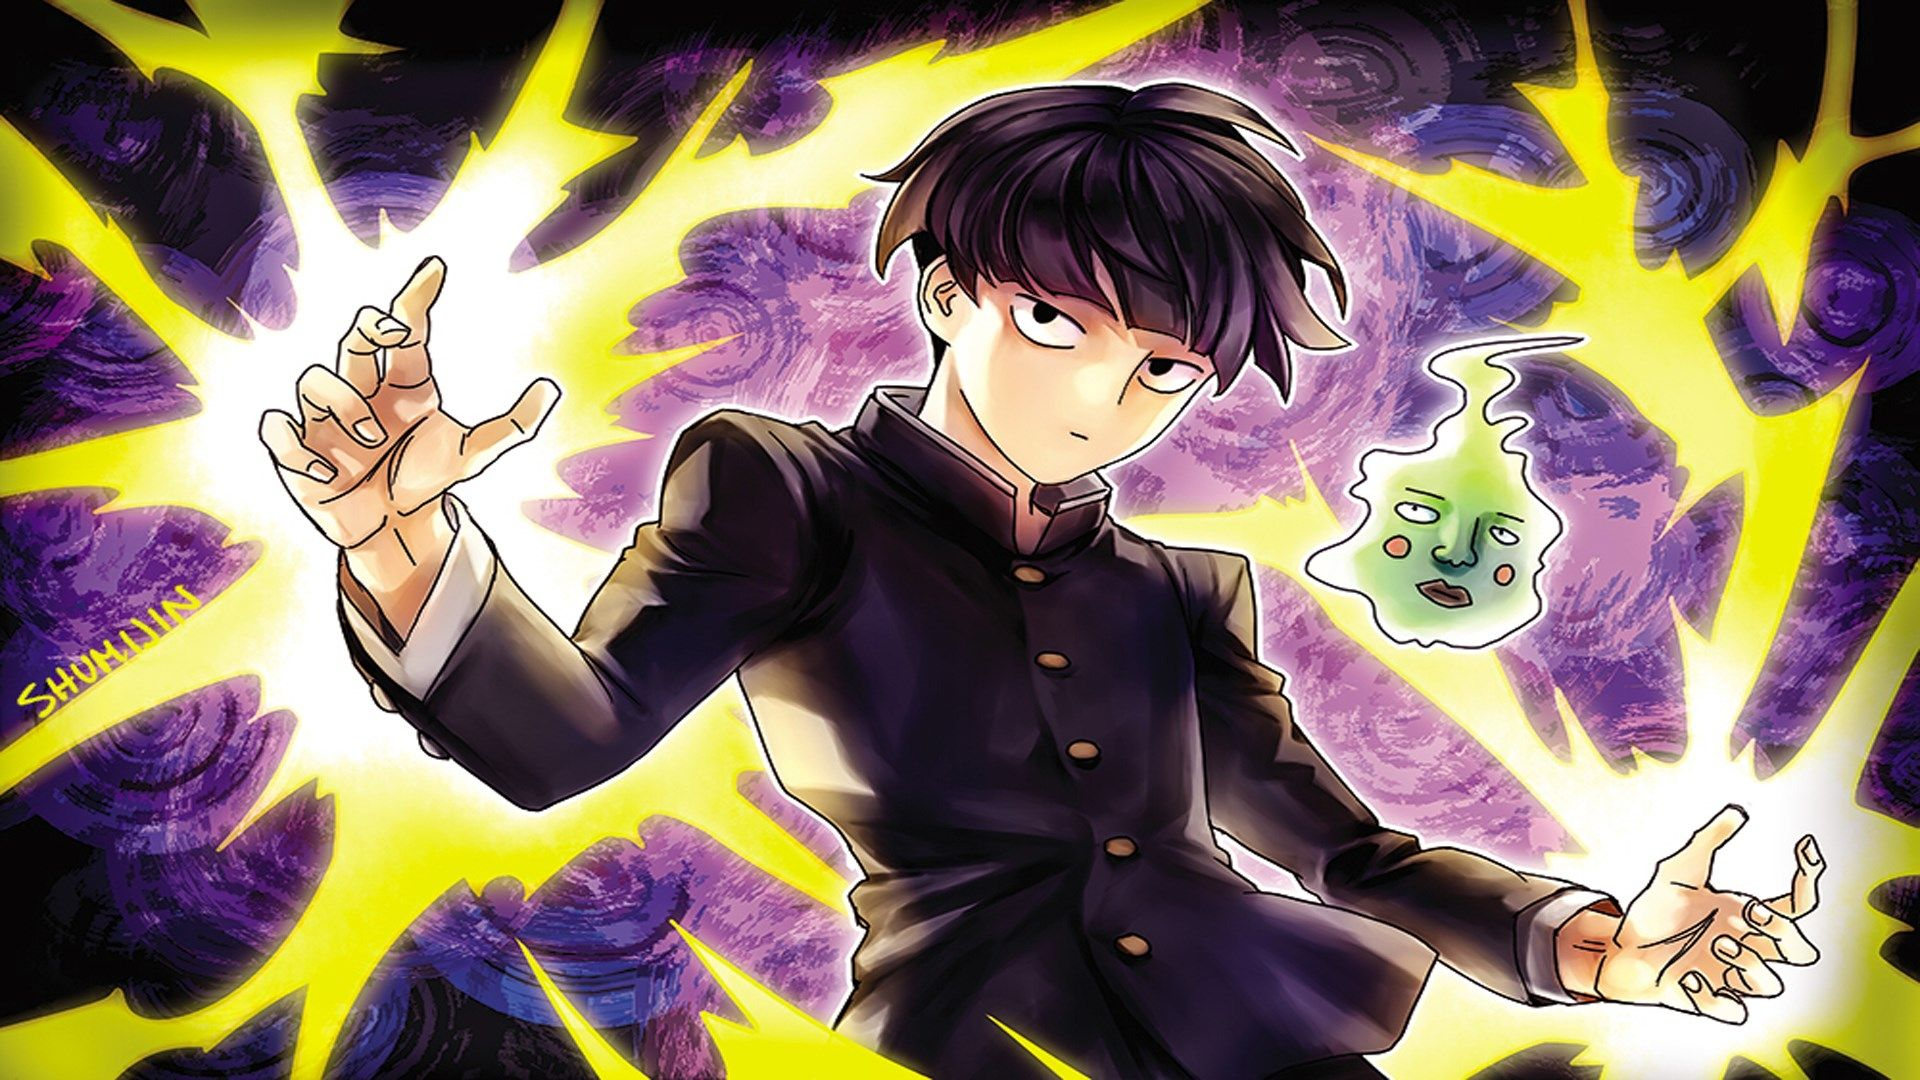 Free Desktop Wallpaper Downloads Mob Psycho 100 Mob Psycho 100 Anime Mob Psycho Mob Psycho 100